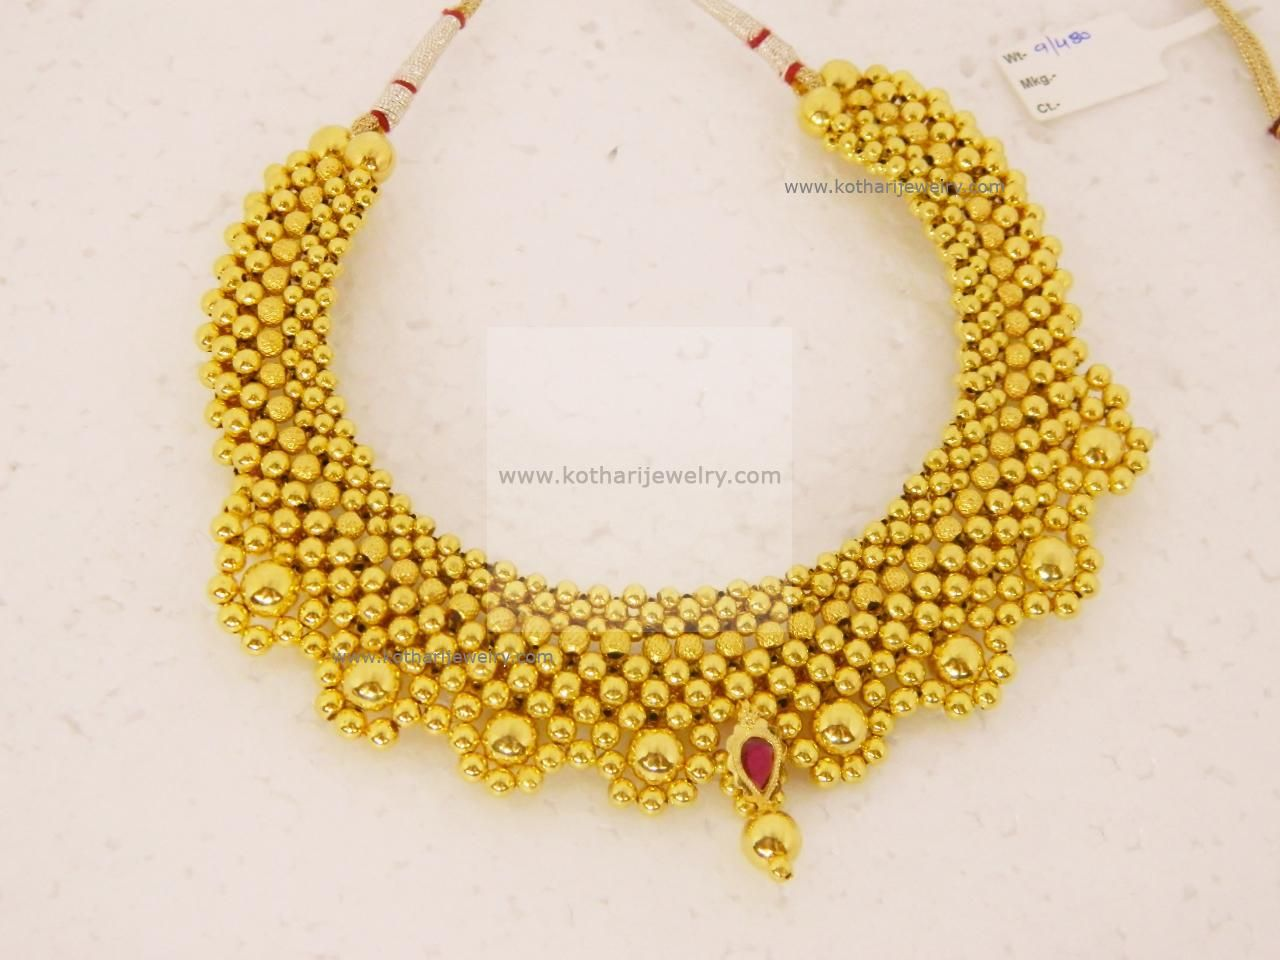 Pin by saniya fattani on Gold jewel | Pinterest | Gold jewellery ...